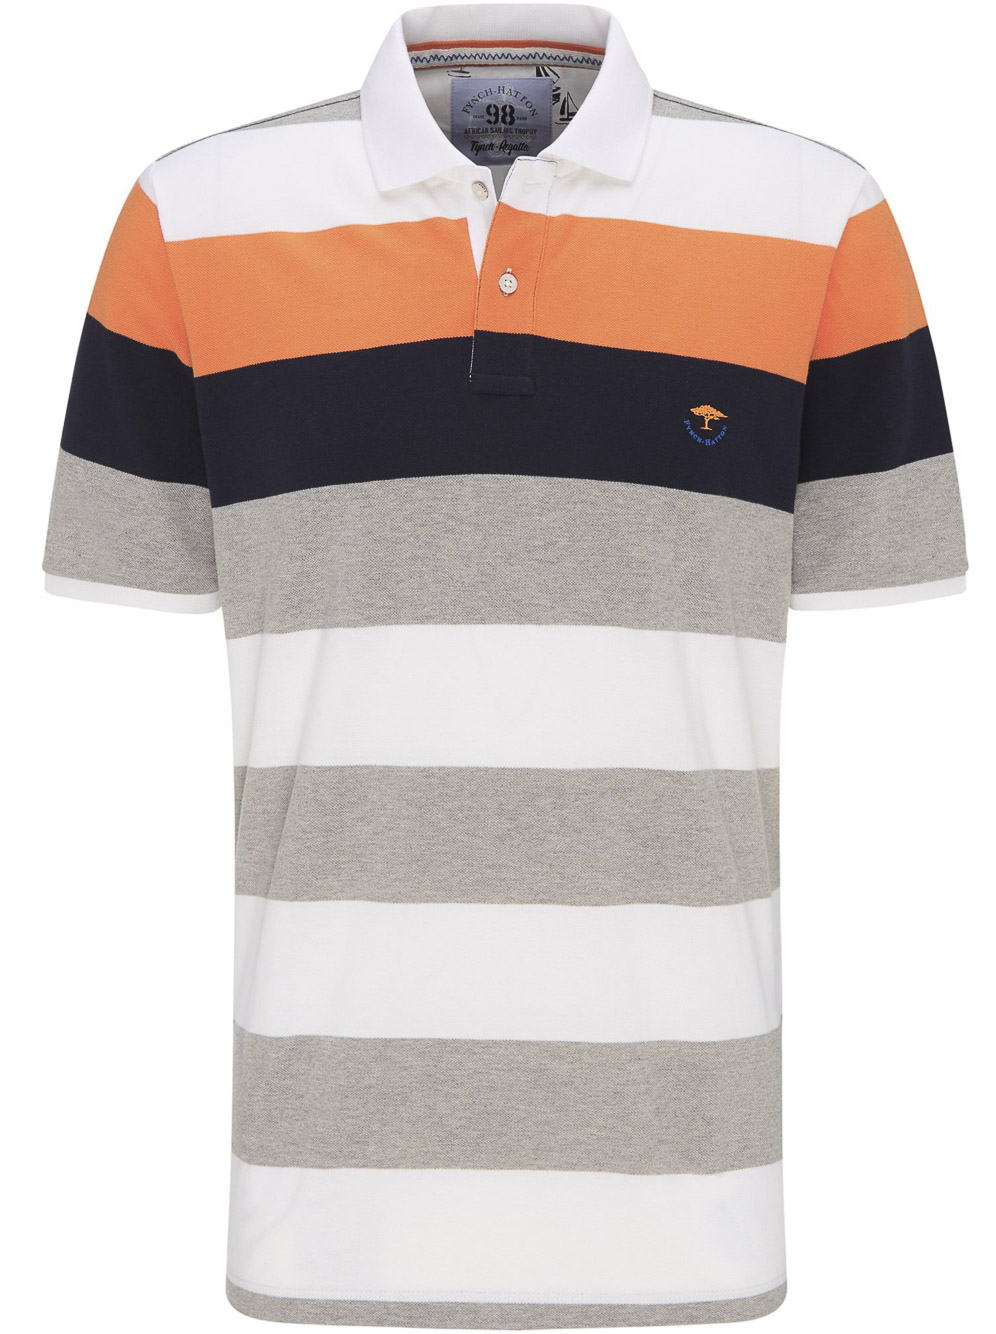 FYNCH-HATTON Μπλούζα Polo 1120 1764-1017 ΡΙΓΕ